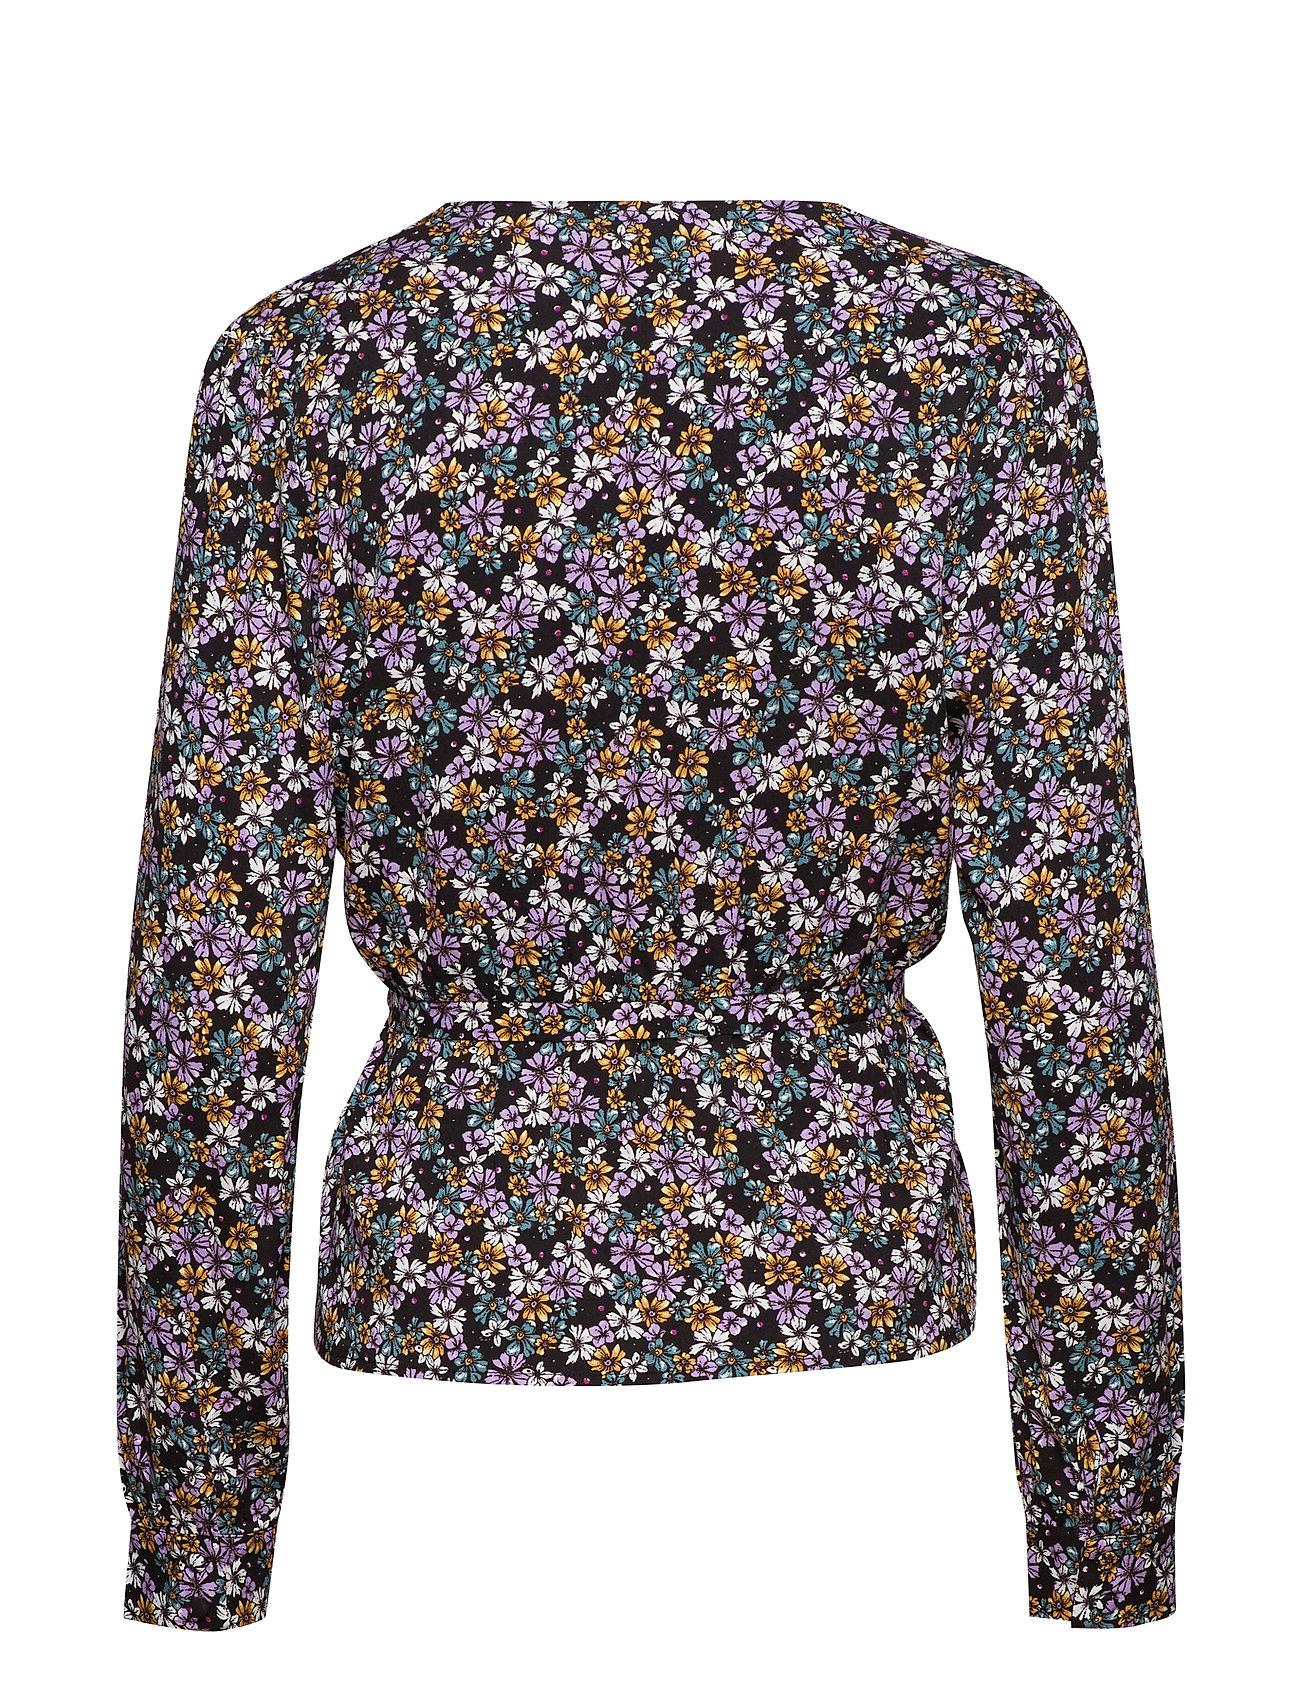 Fayagz Shirt Ze1 19purple FlowerGestuz black bfm7vIYg6y